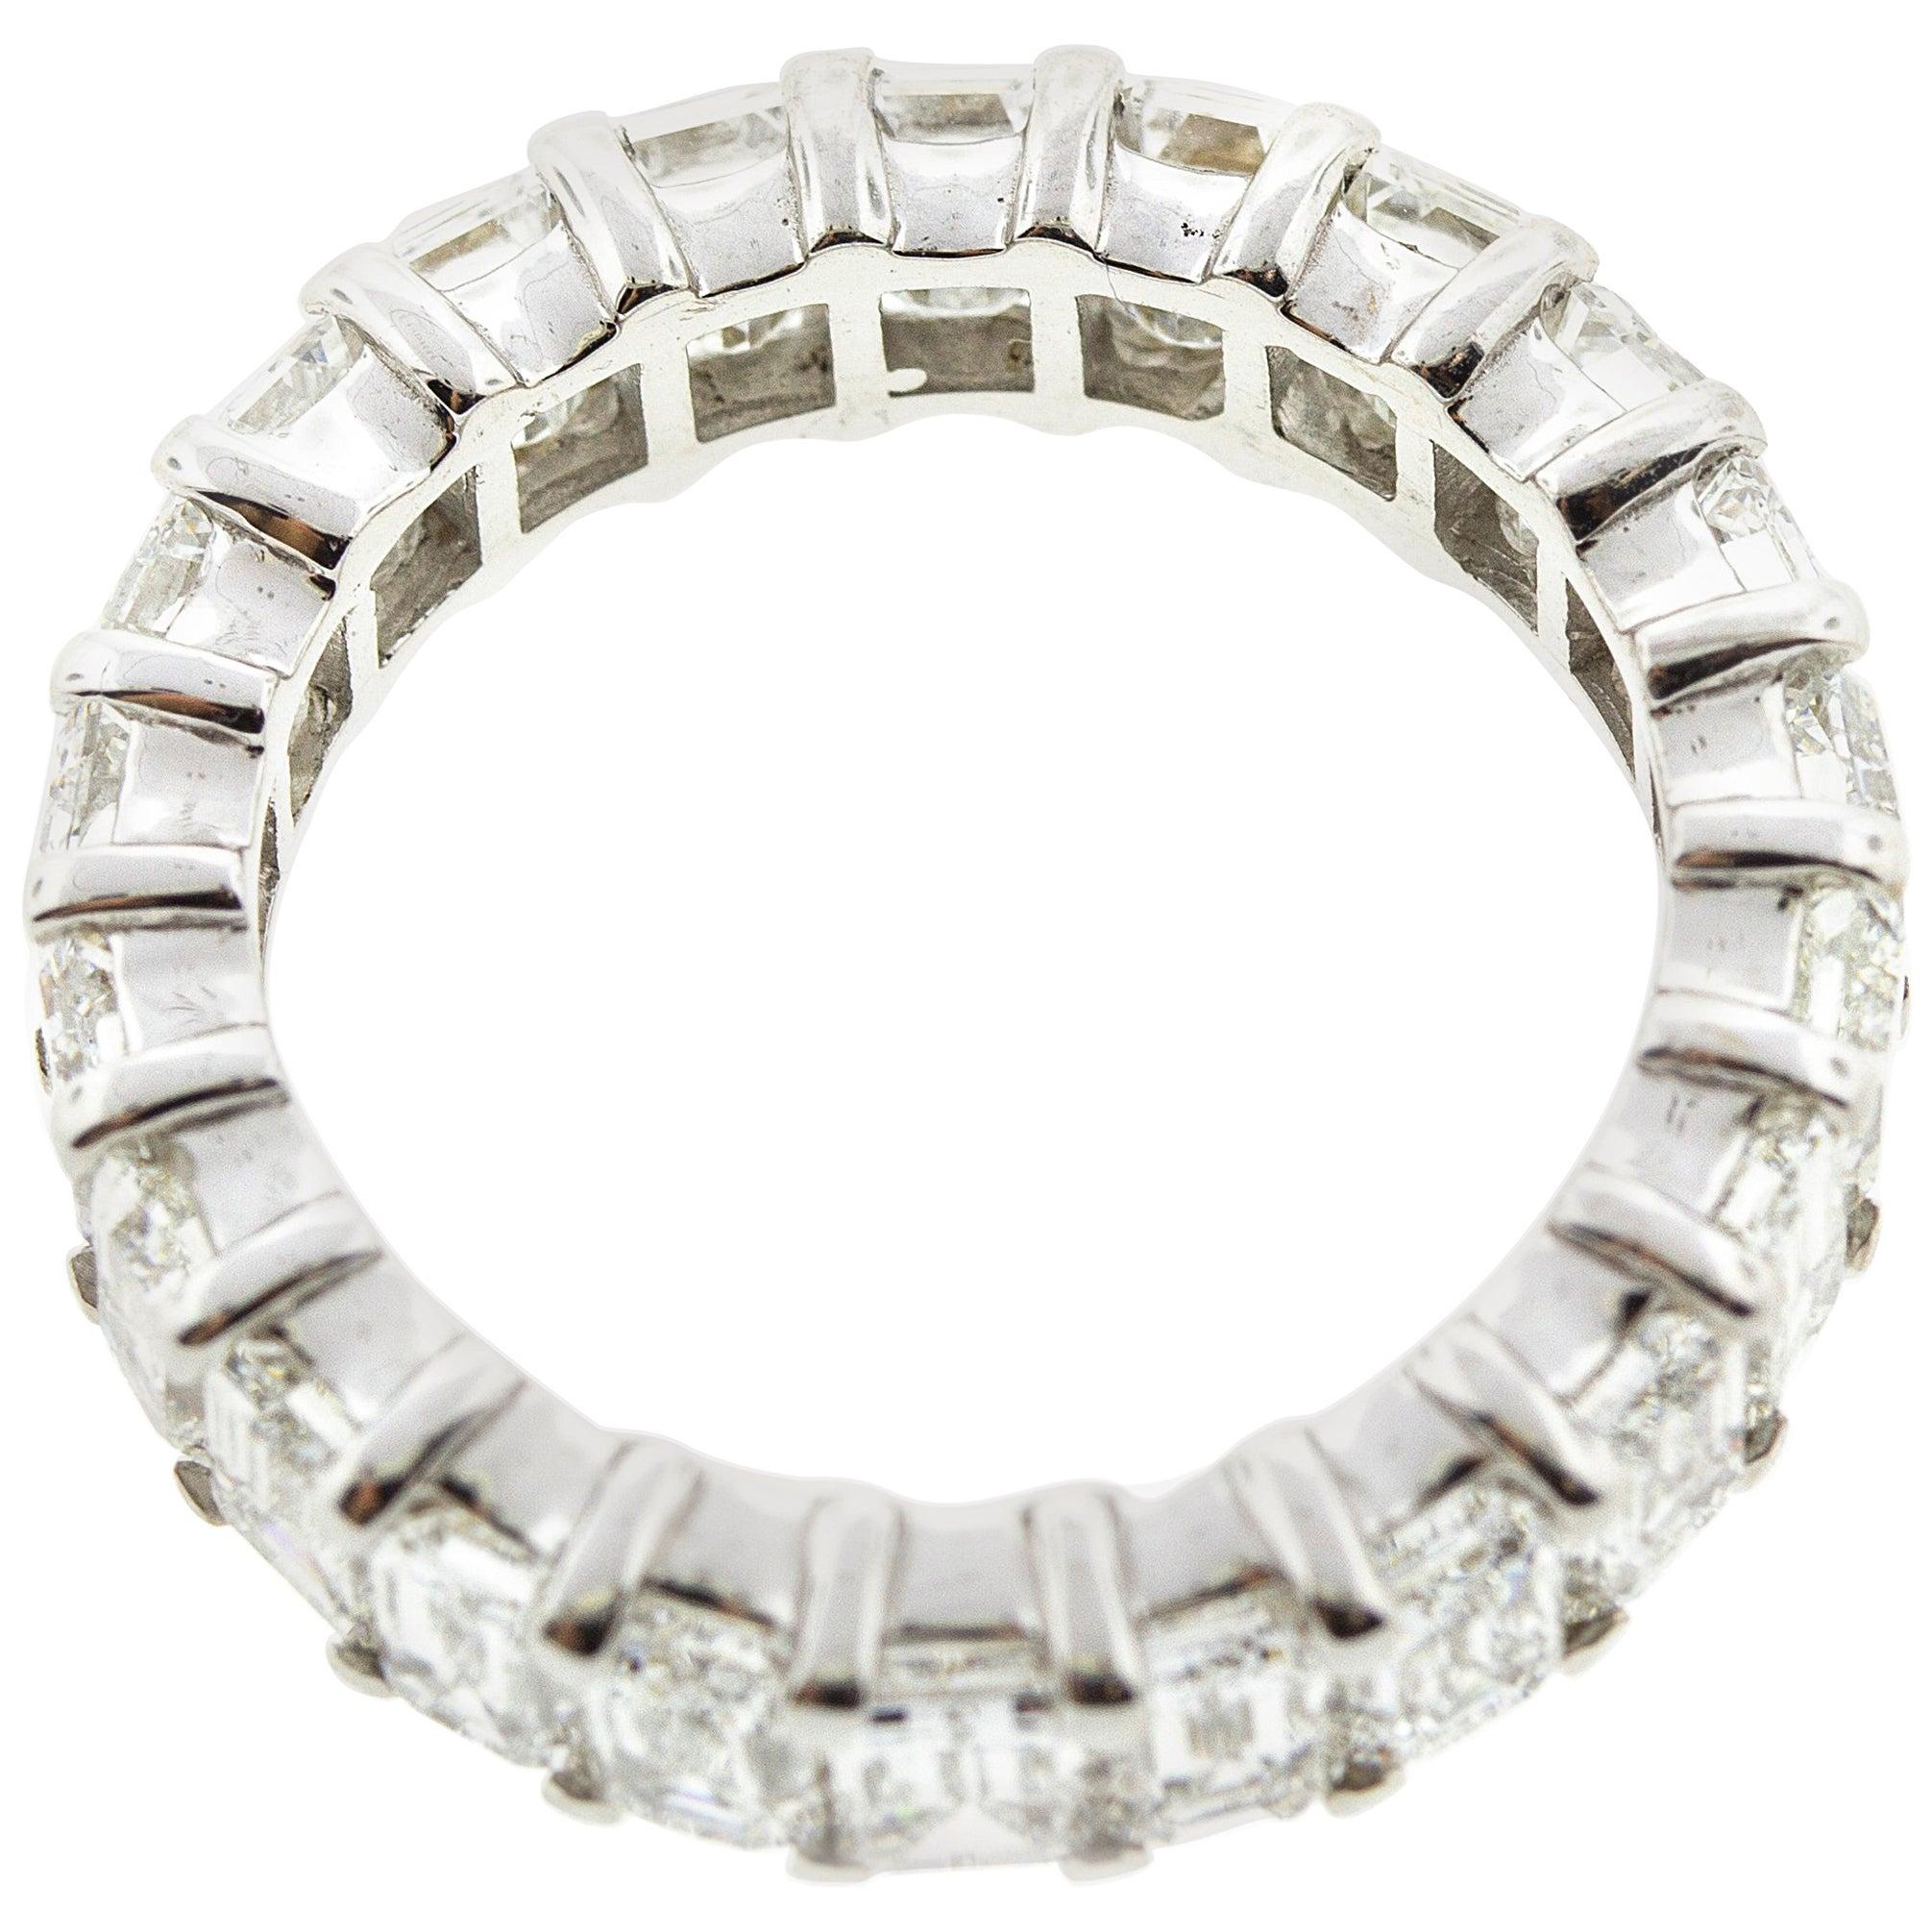 Emerald Cut Diamond Eternity Band 6.65 Carat